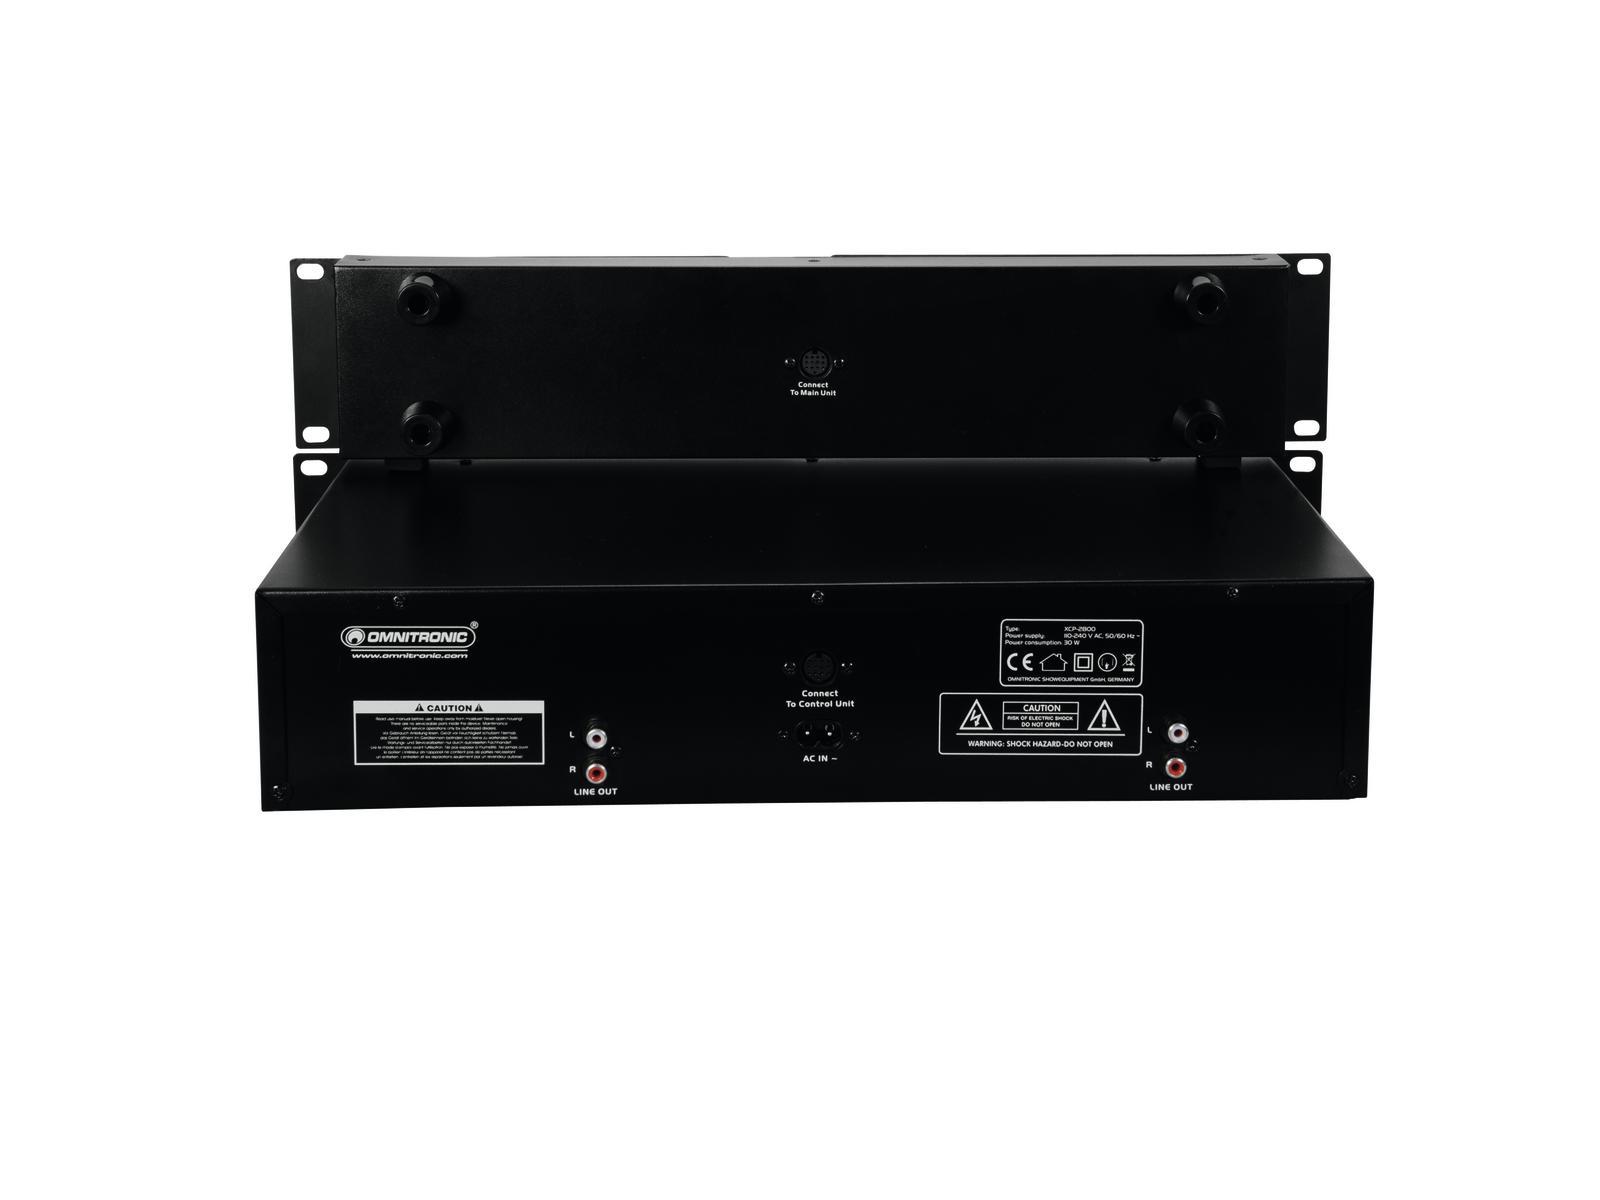 OMNITRONIC XCP-2800 Dual-CD-Player